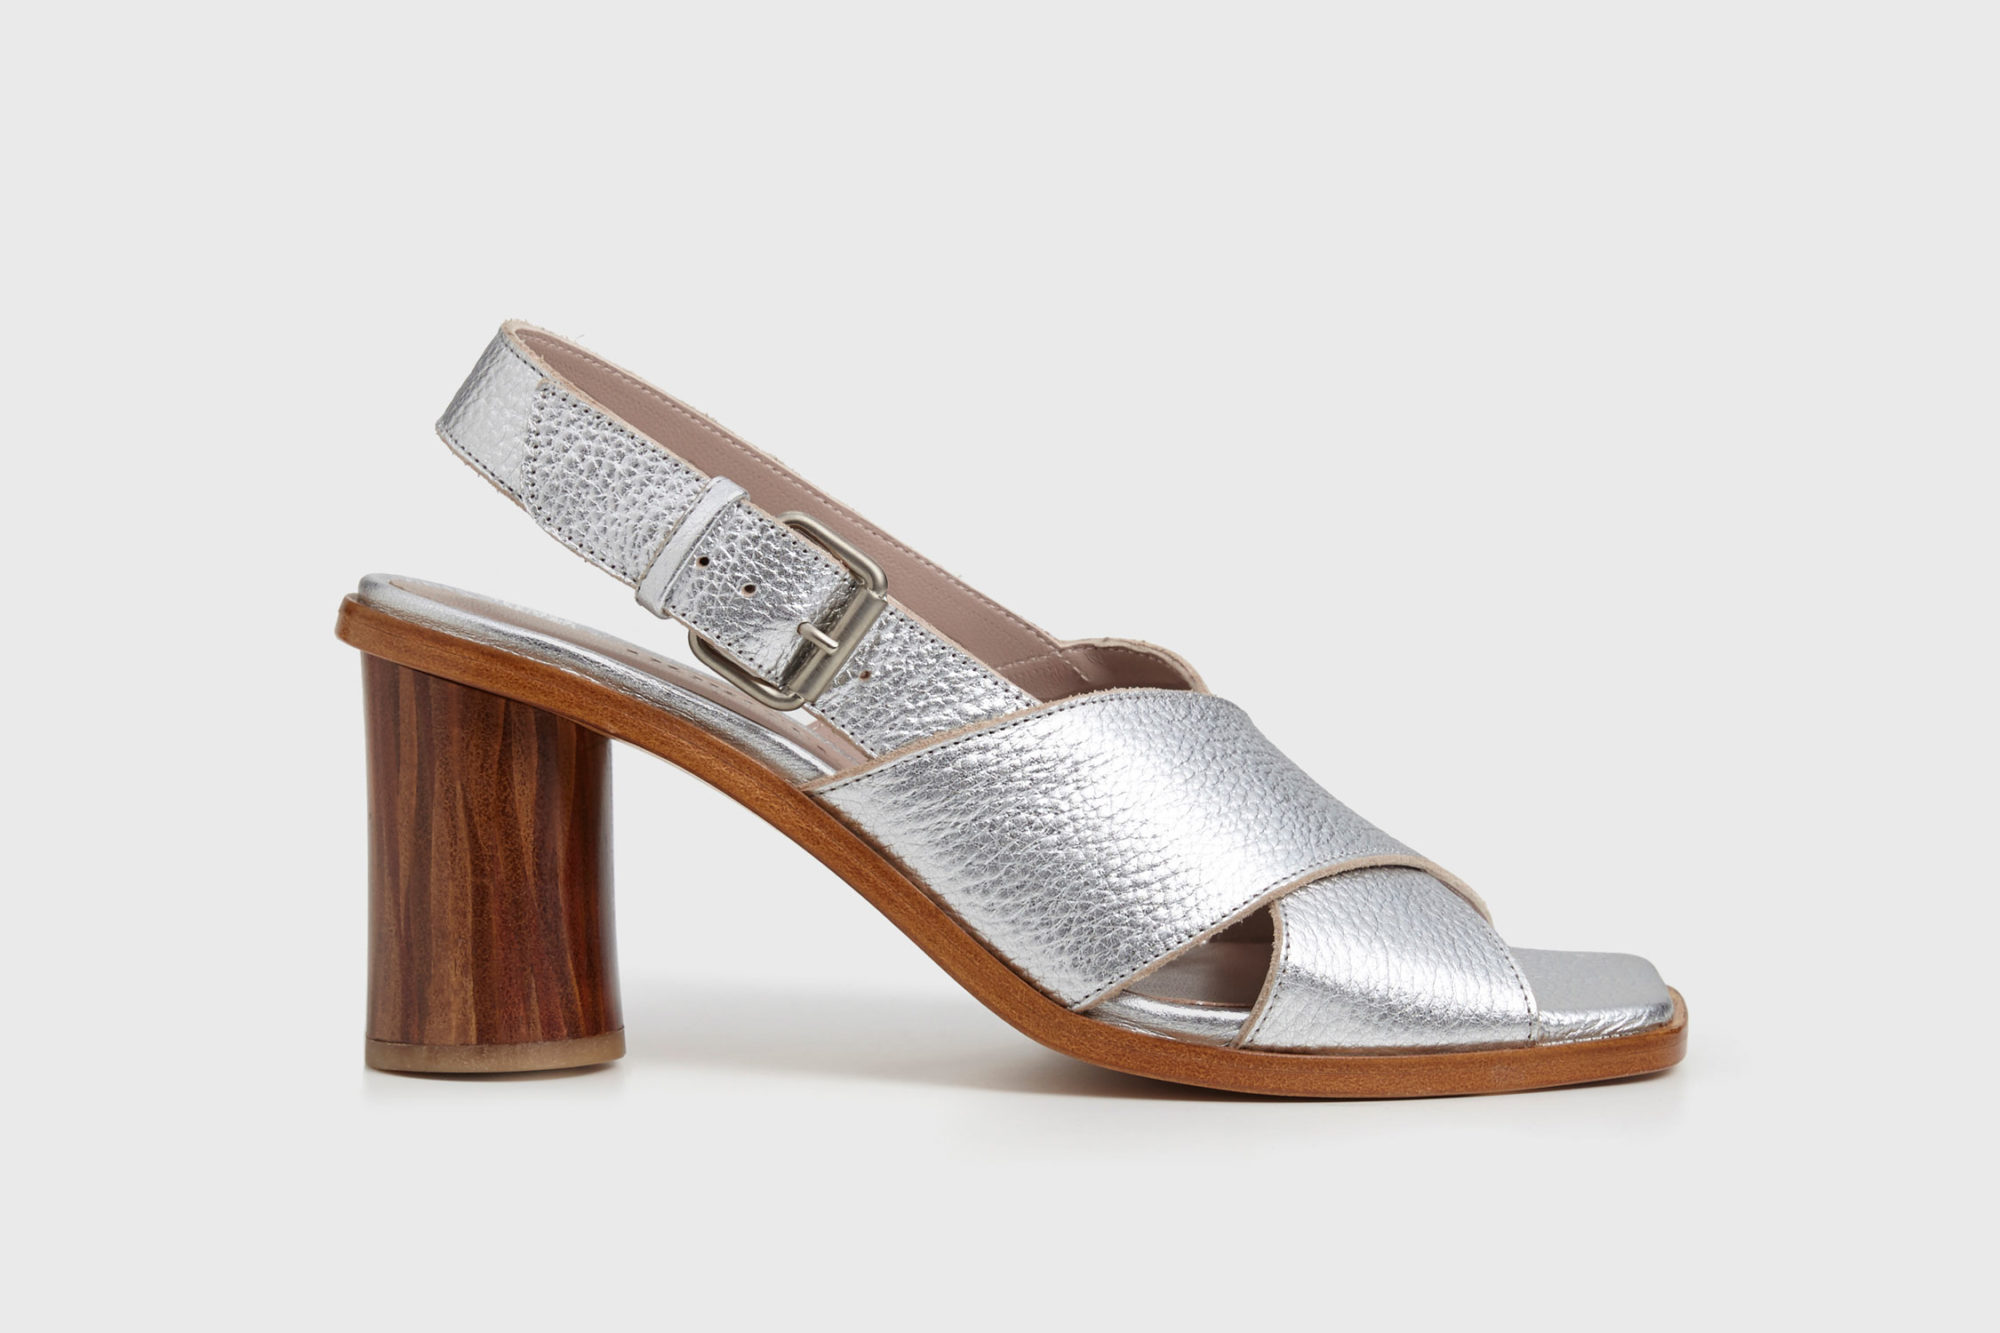 Dorotea sandalia de tacón alto Jazz plateado ss17 perfil